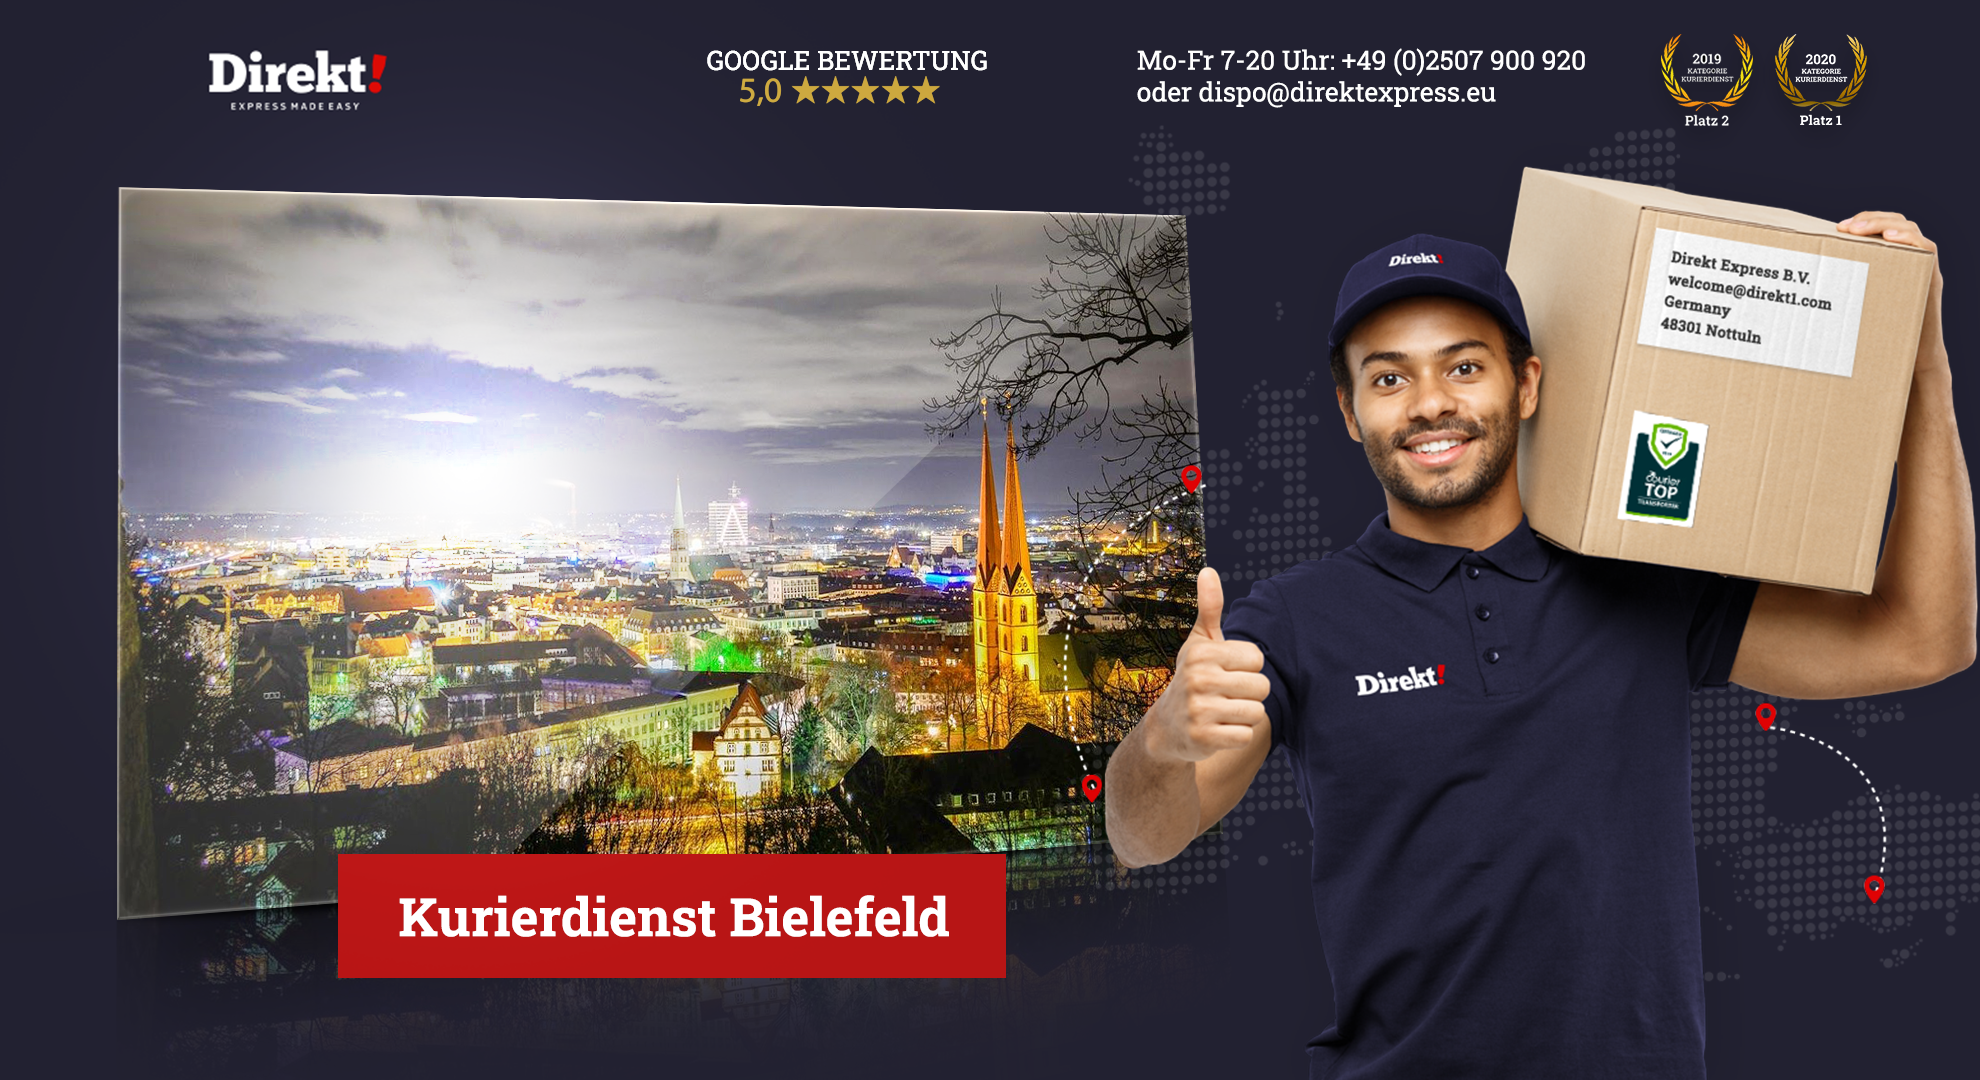 https://direkt1.com/wp-content/uploads/2020/12/Kurierdienst-bielefeld-buchen.png